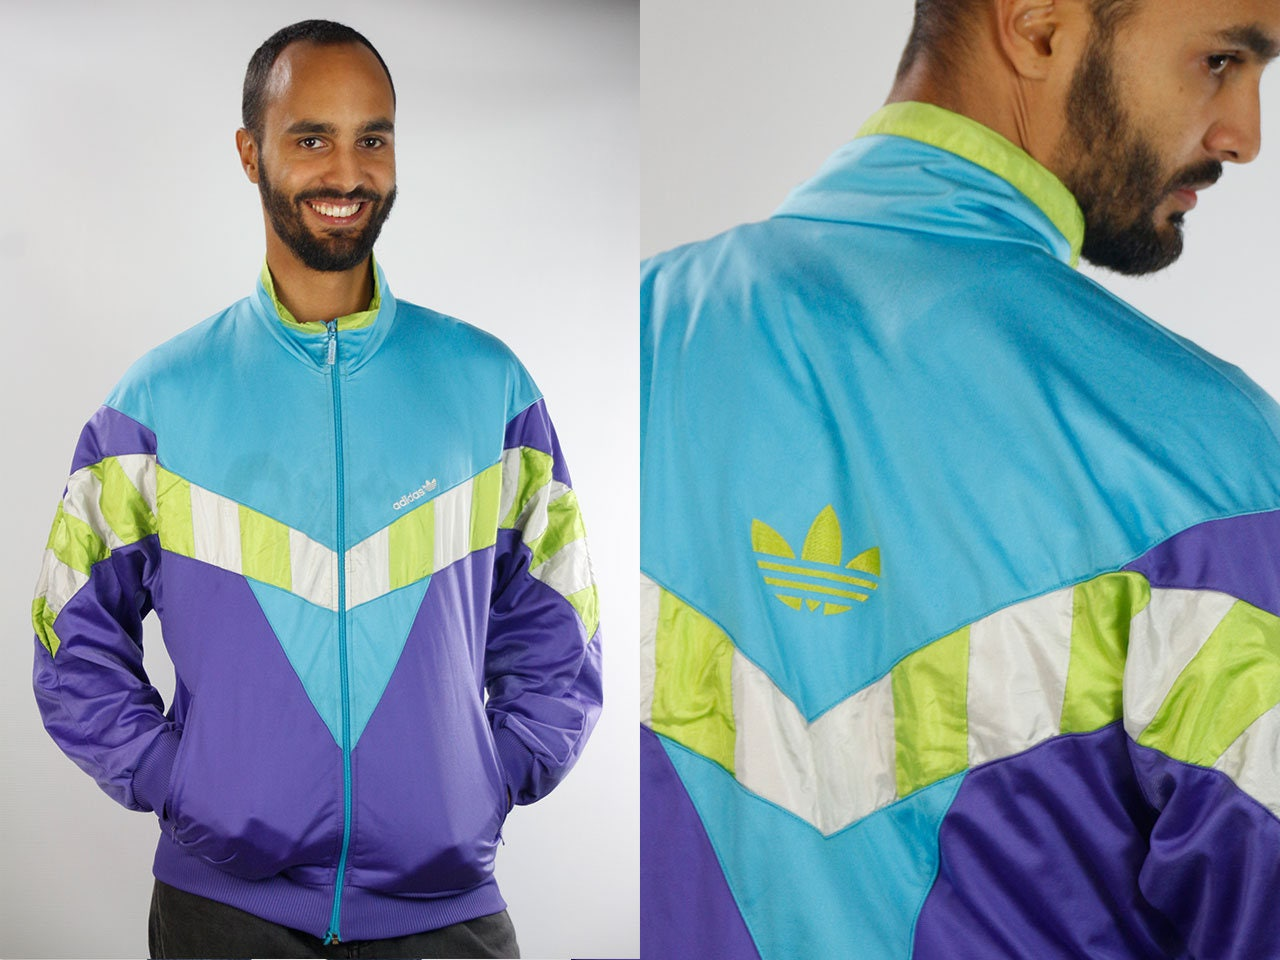 635dc33586d4 Adidas Windbreaker   Adidas Tracksuit   Adidas Track Jacket   Adidas ...